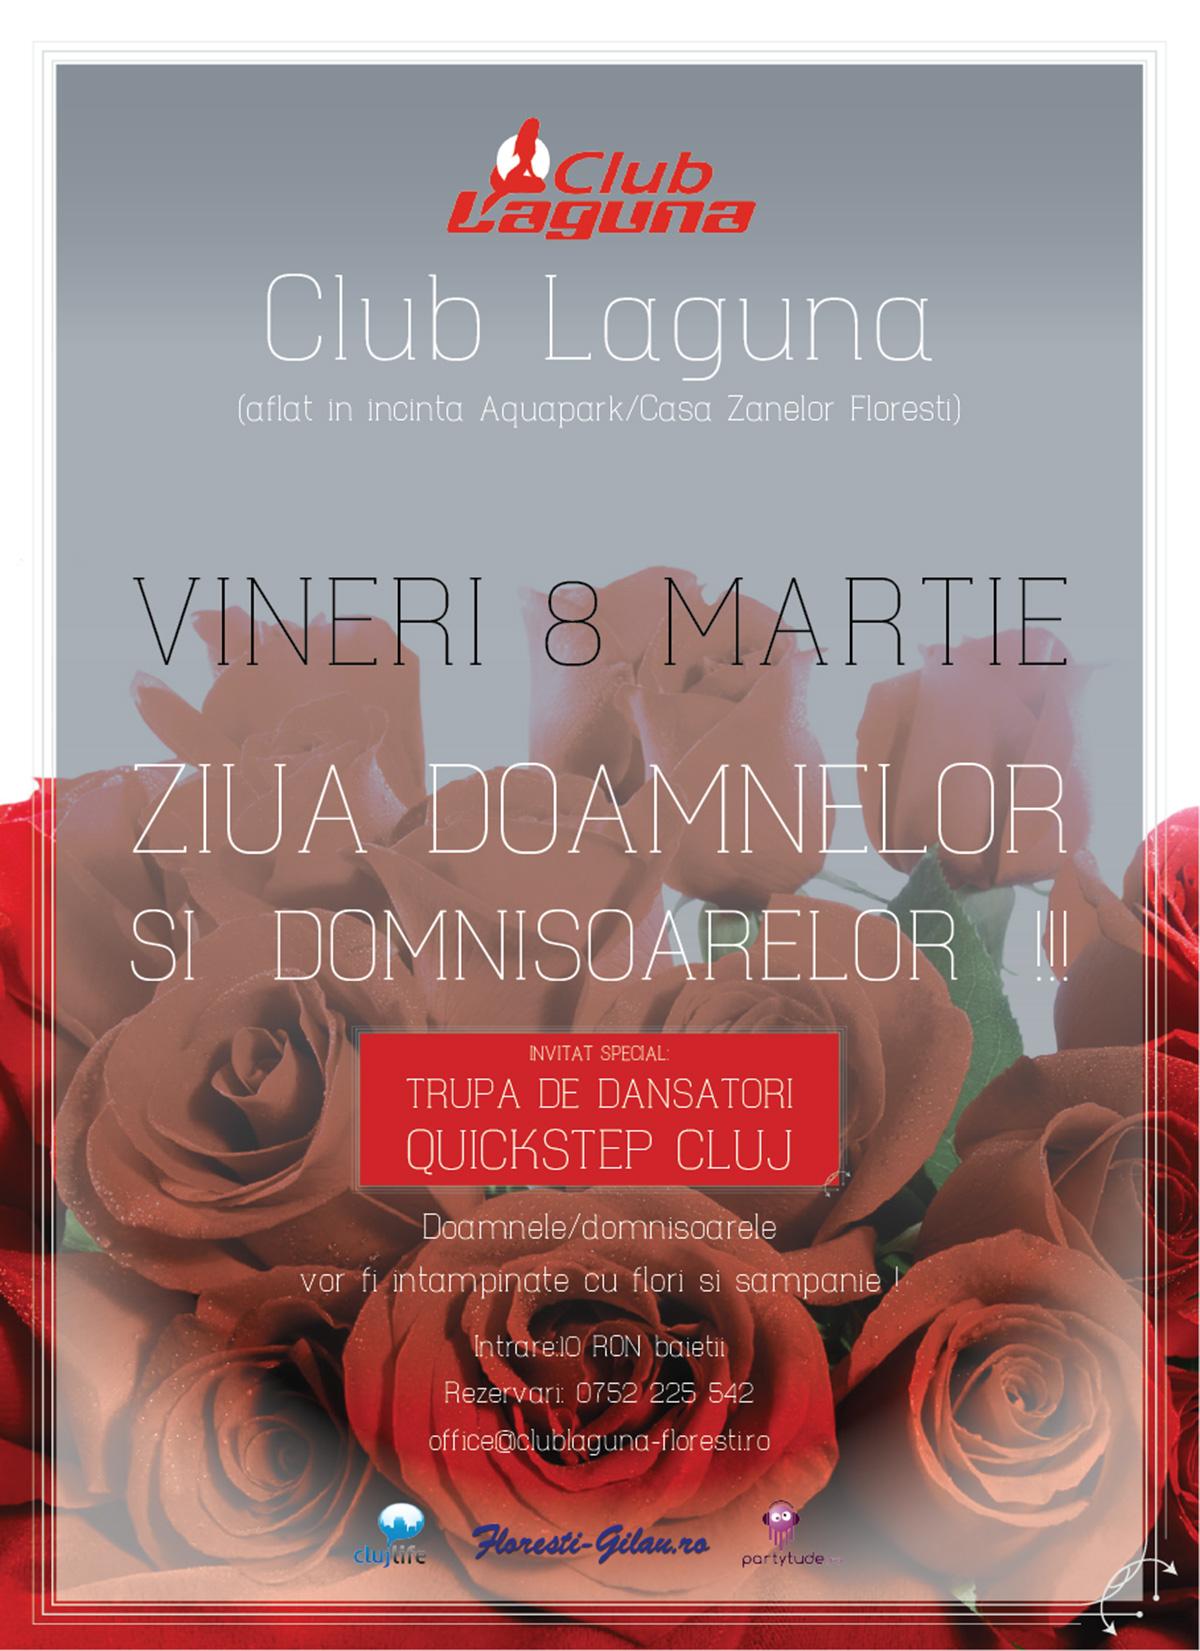 Ziua Doamnelor si Domnisoarelor  @ Club Laguna